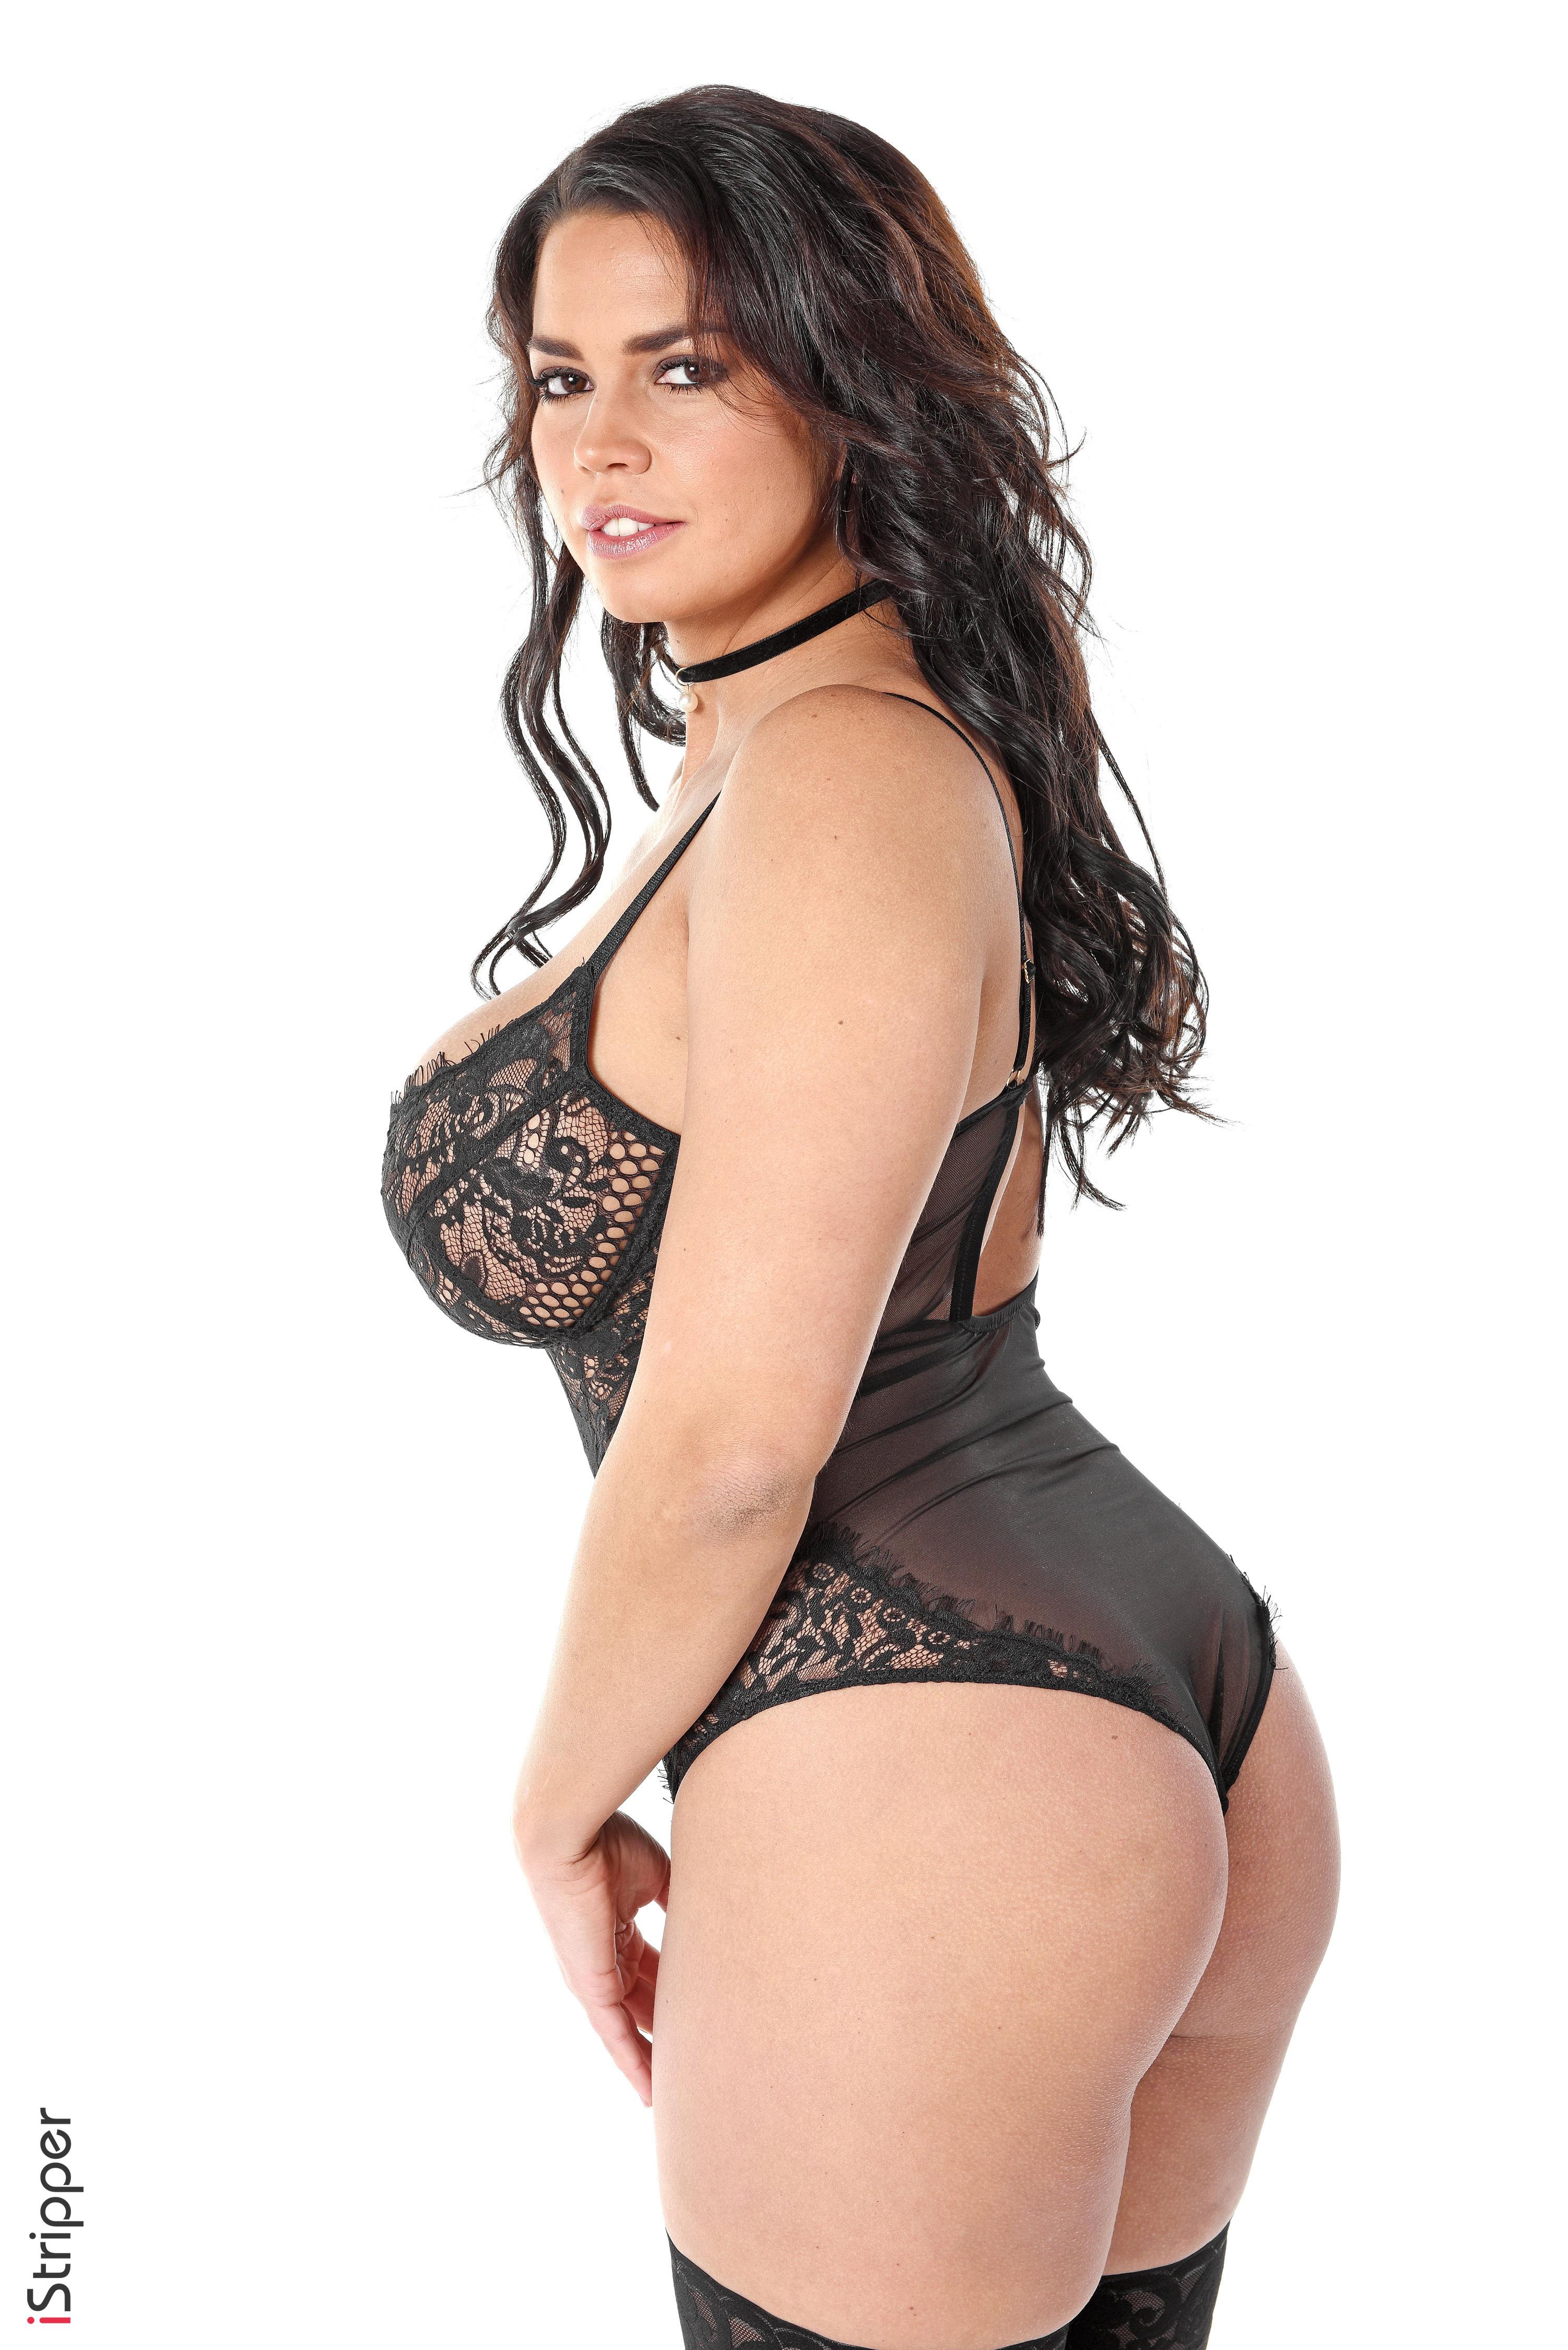 hot girls nude wallpaper